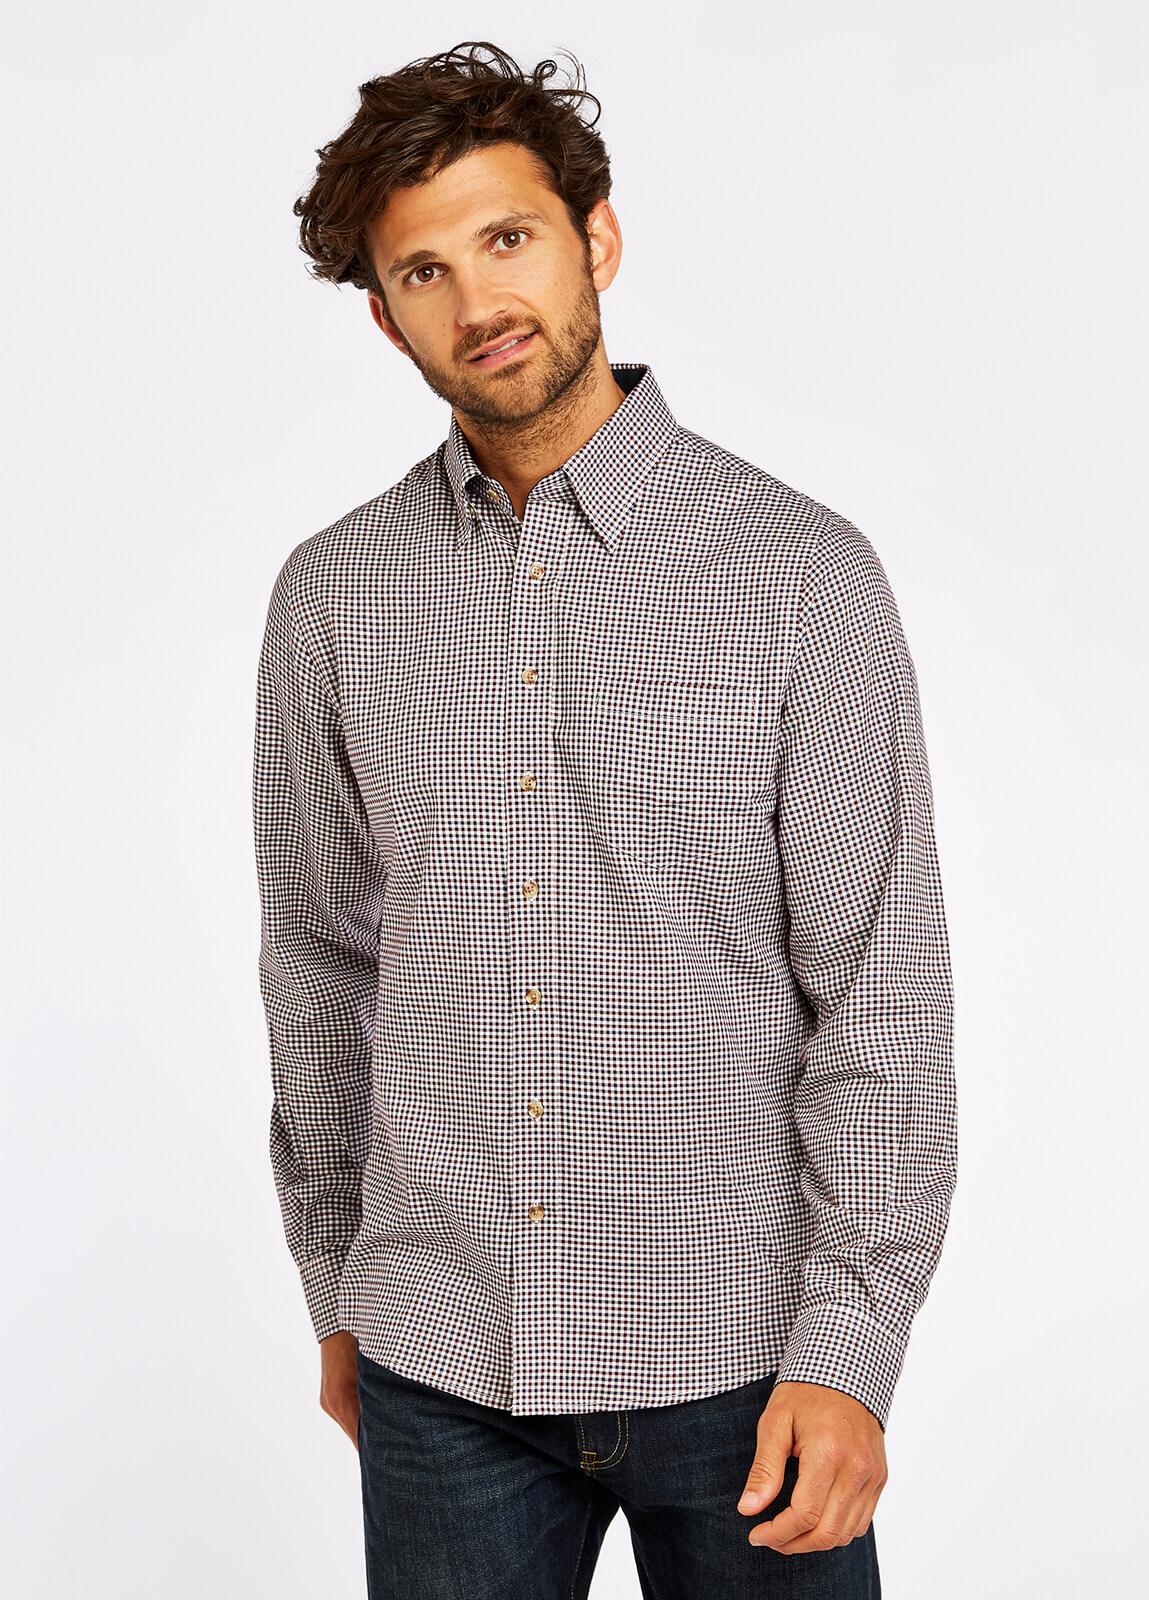 Shrewsbury Shirt - Navy Multi